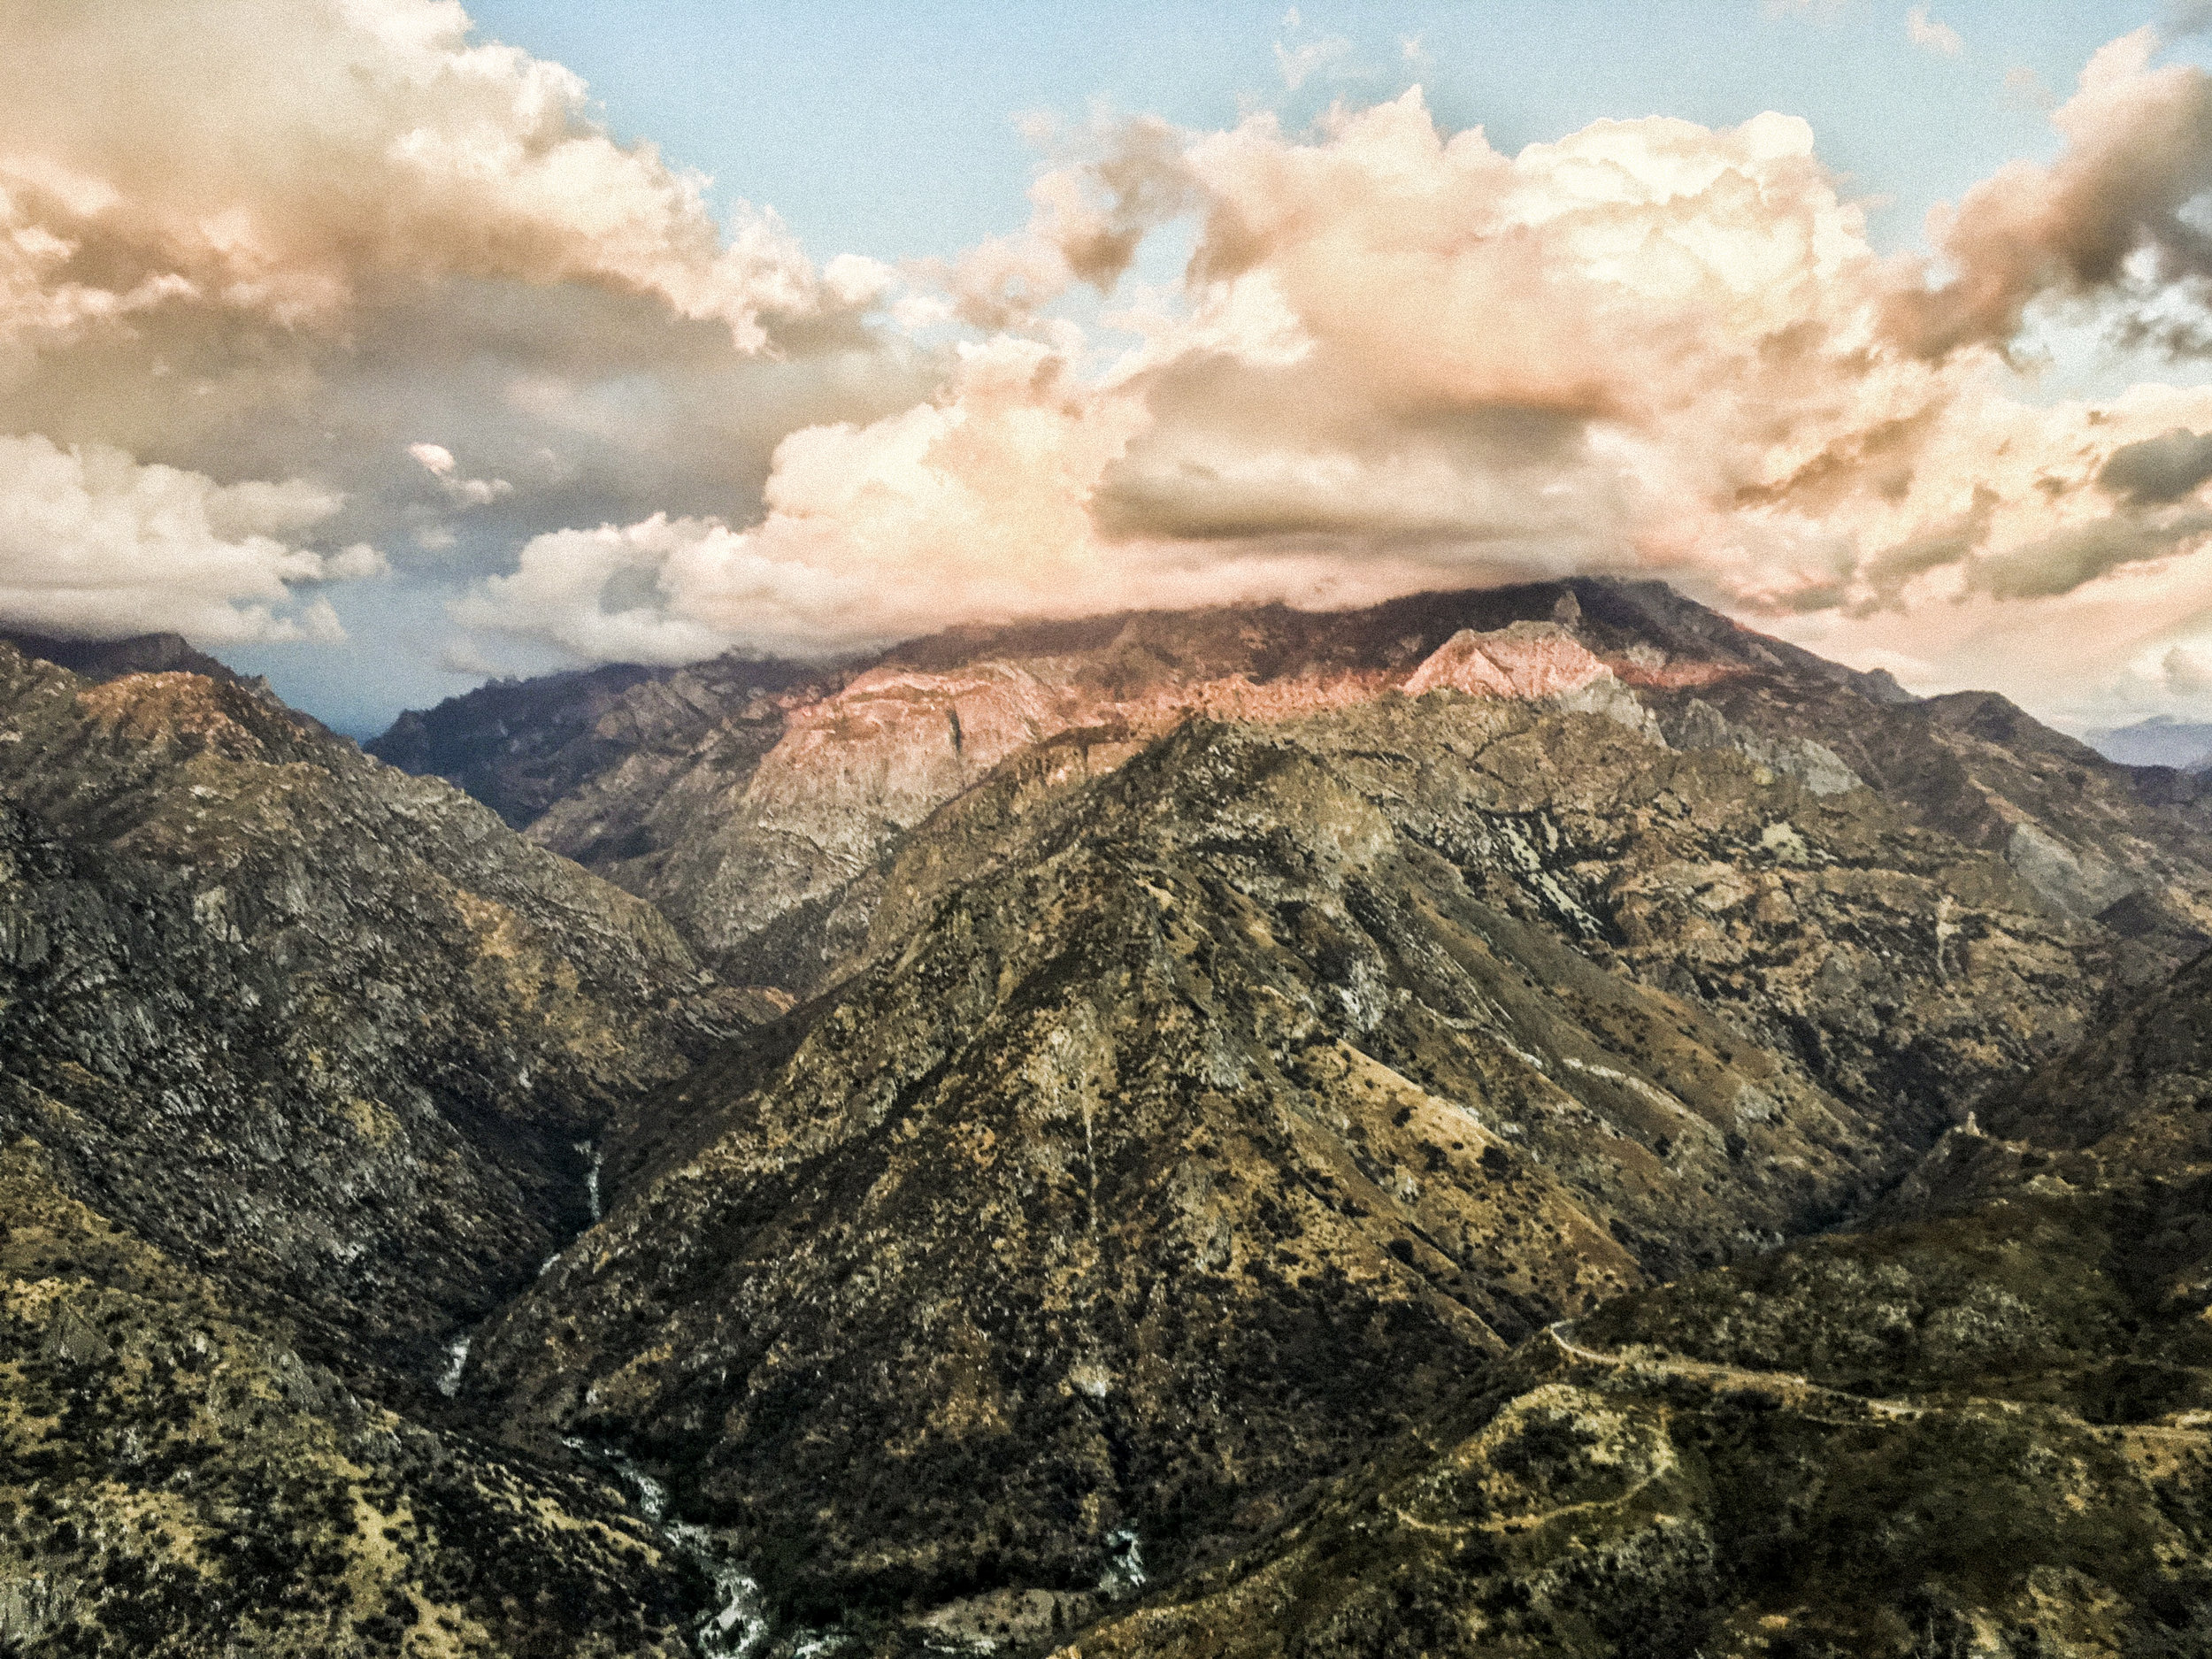 california_adventure_roberto_flores_buck_09.jpg